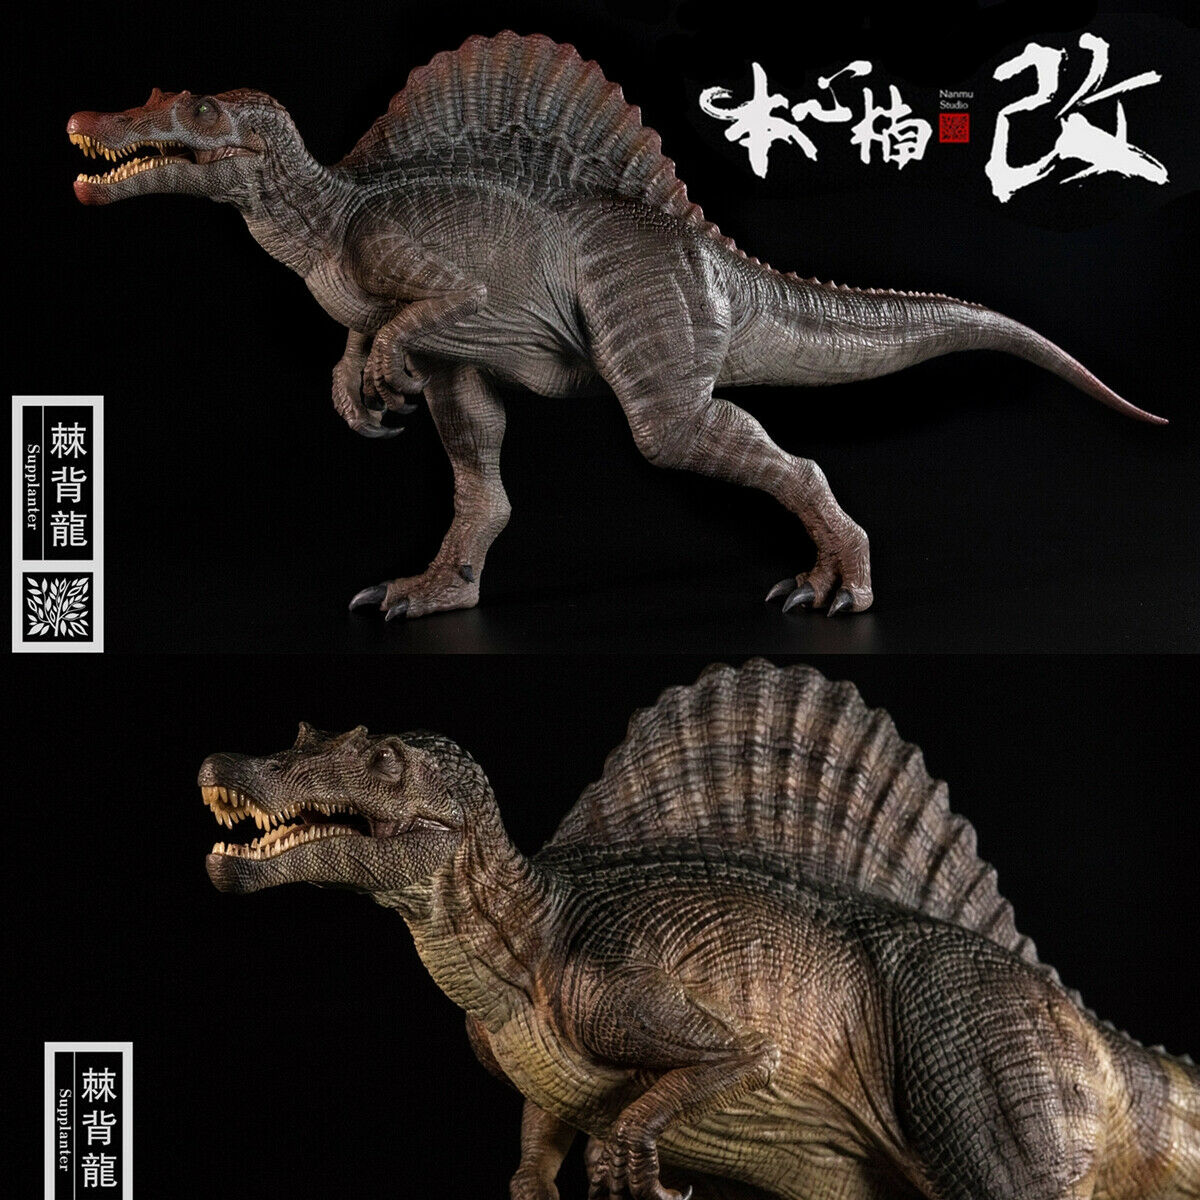 Nanmu Studio 1/35 Scale Spinosaurus Supplanter Jurassic Realistic Dinosaur Action Figure PVC Model Toys Collector